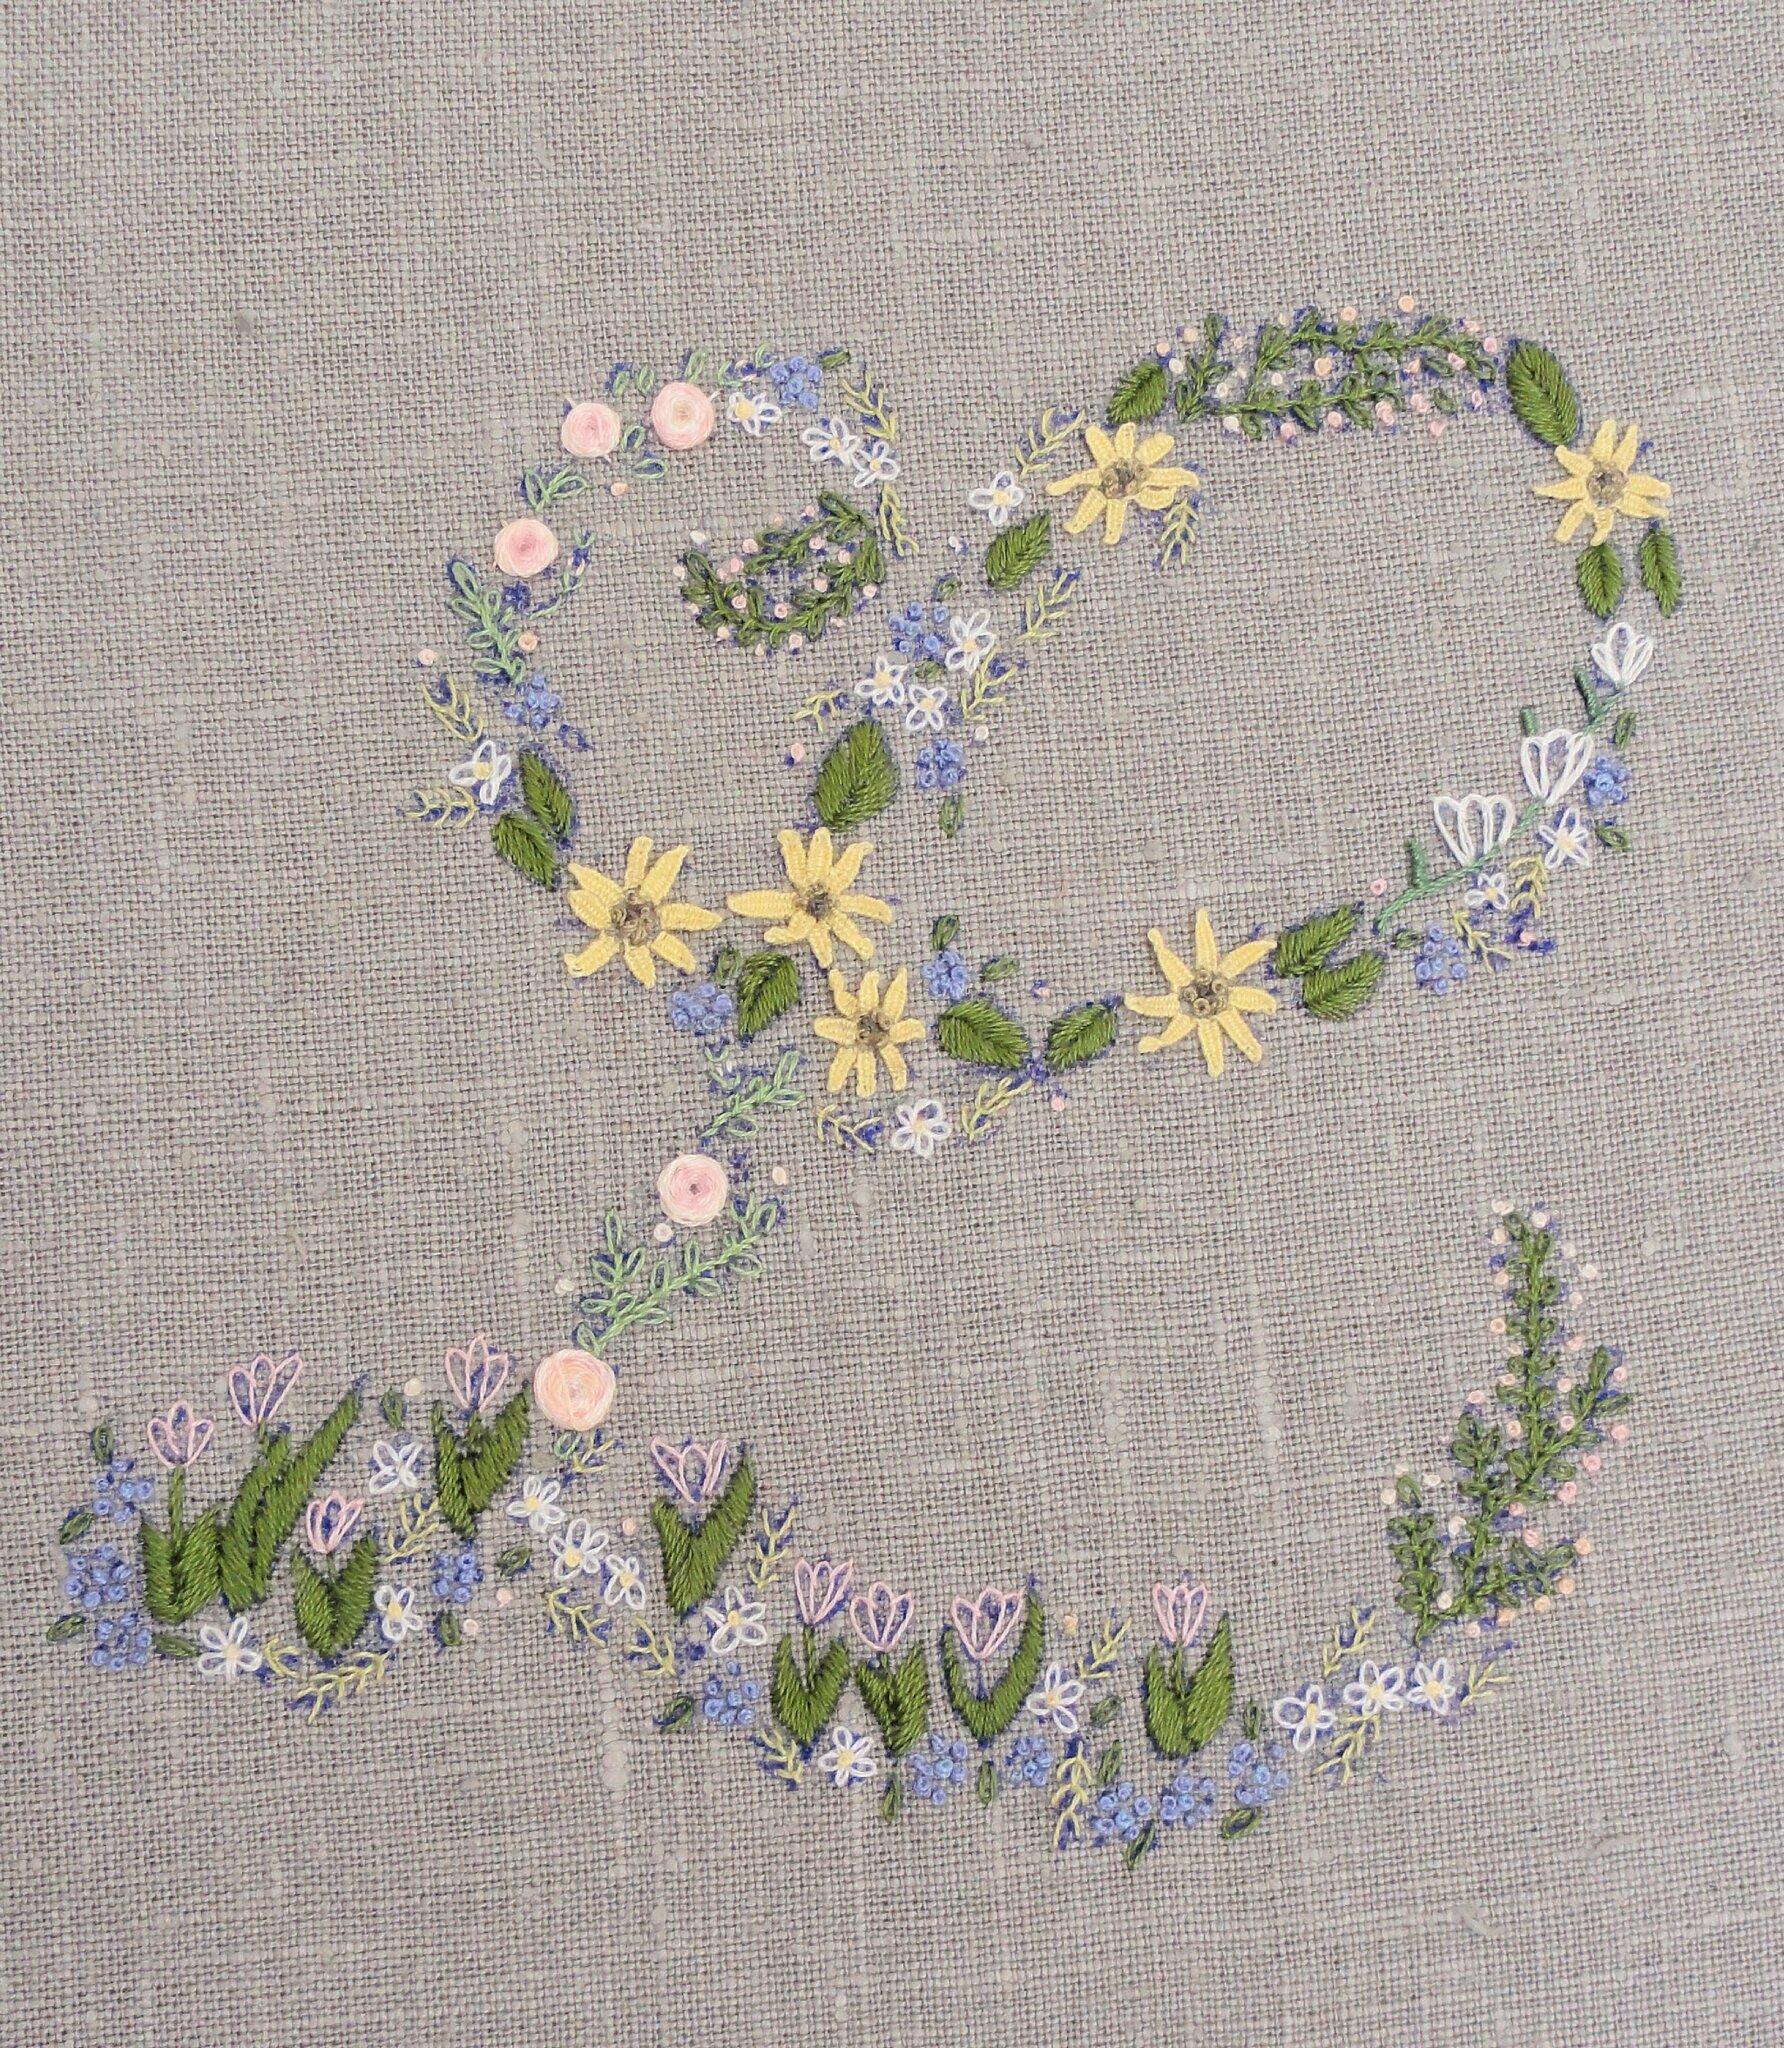 Broderie des mille fleurs